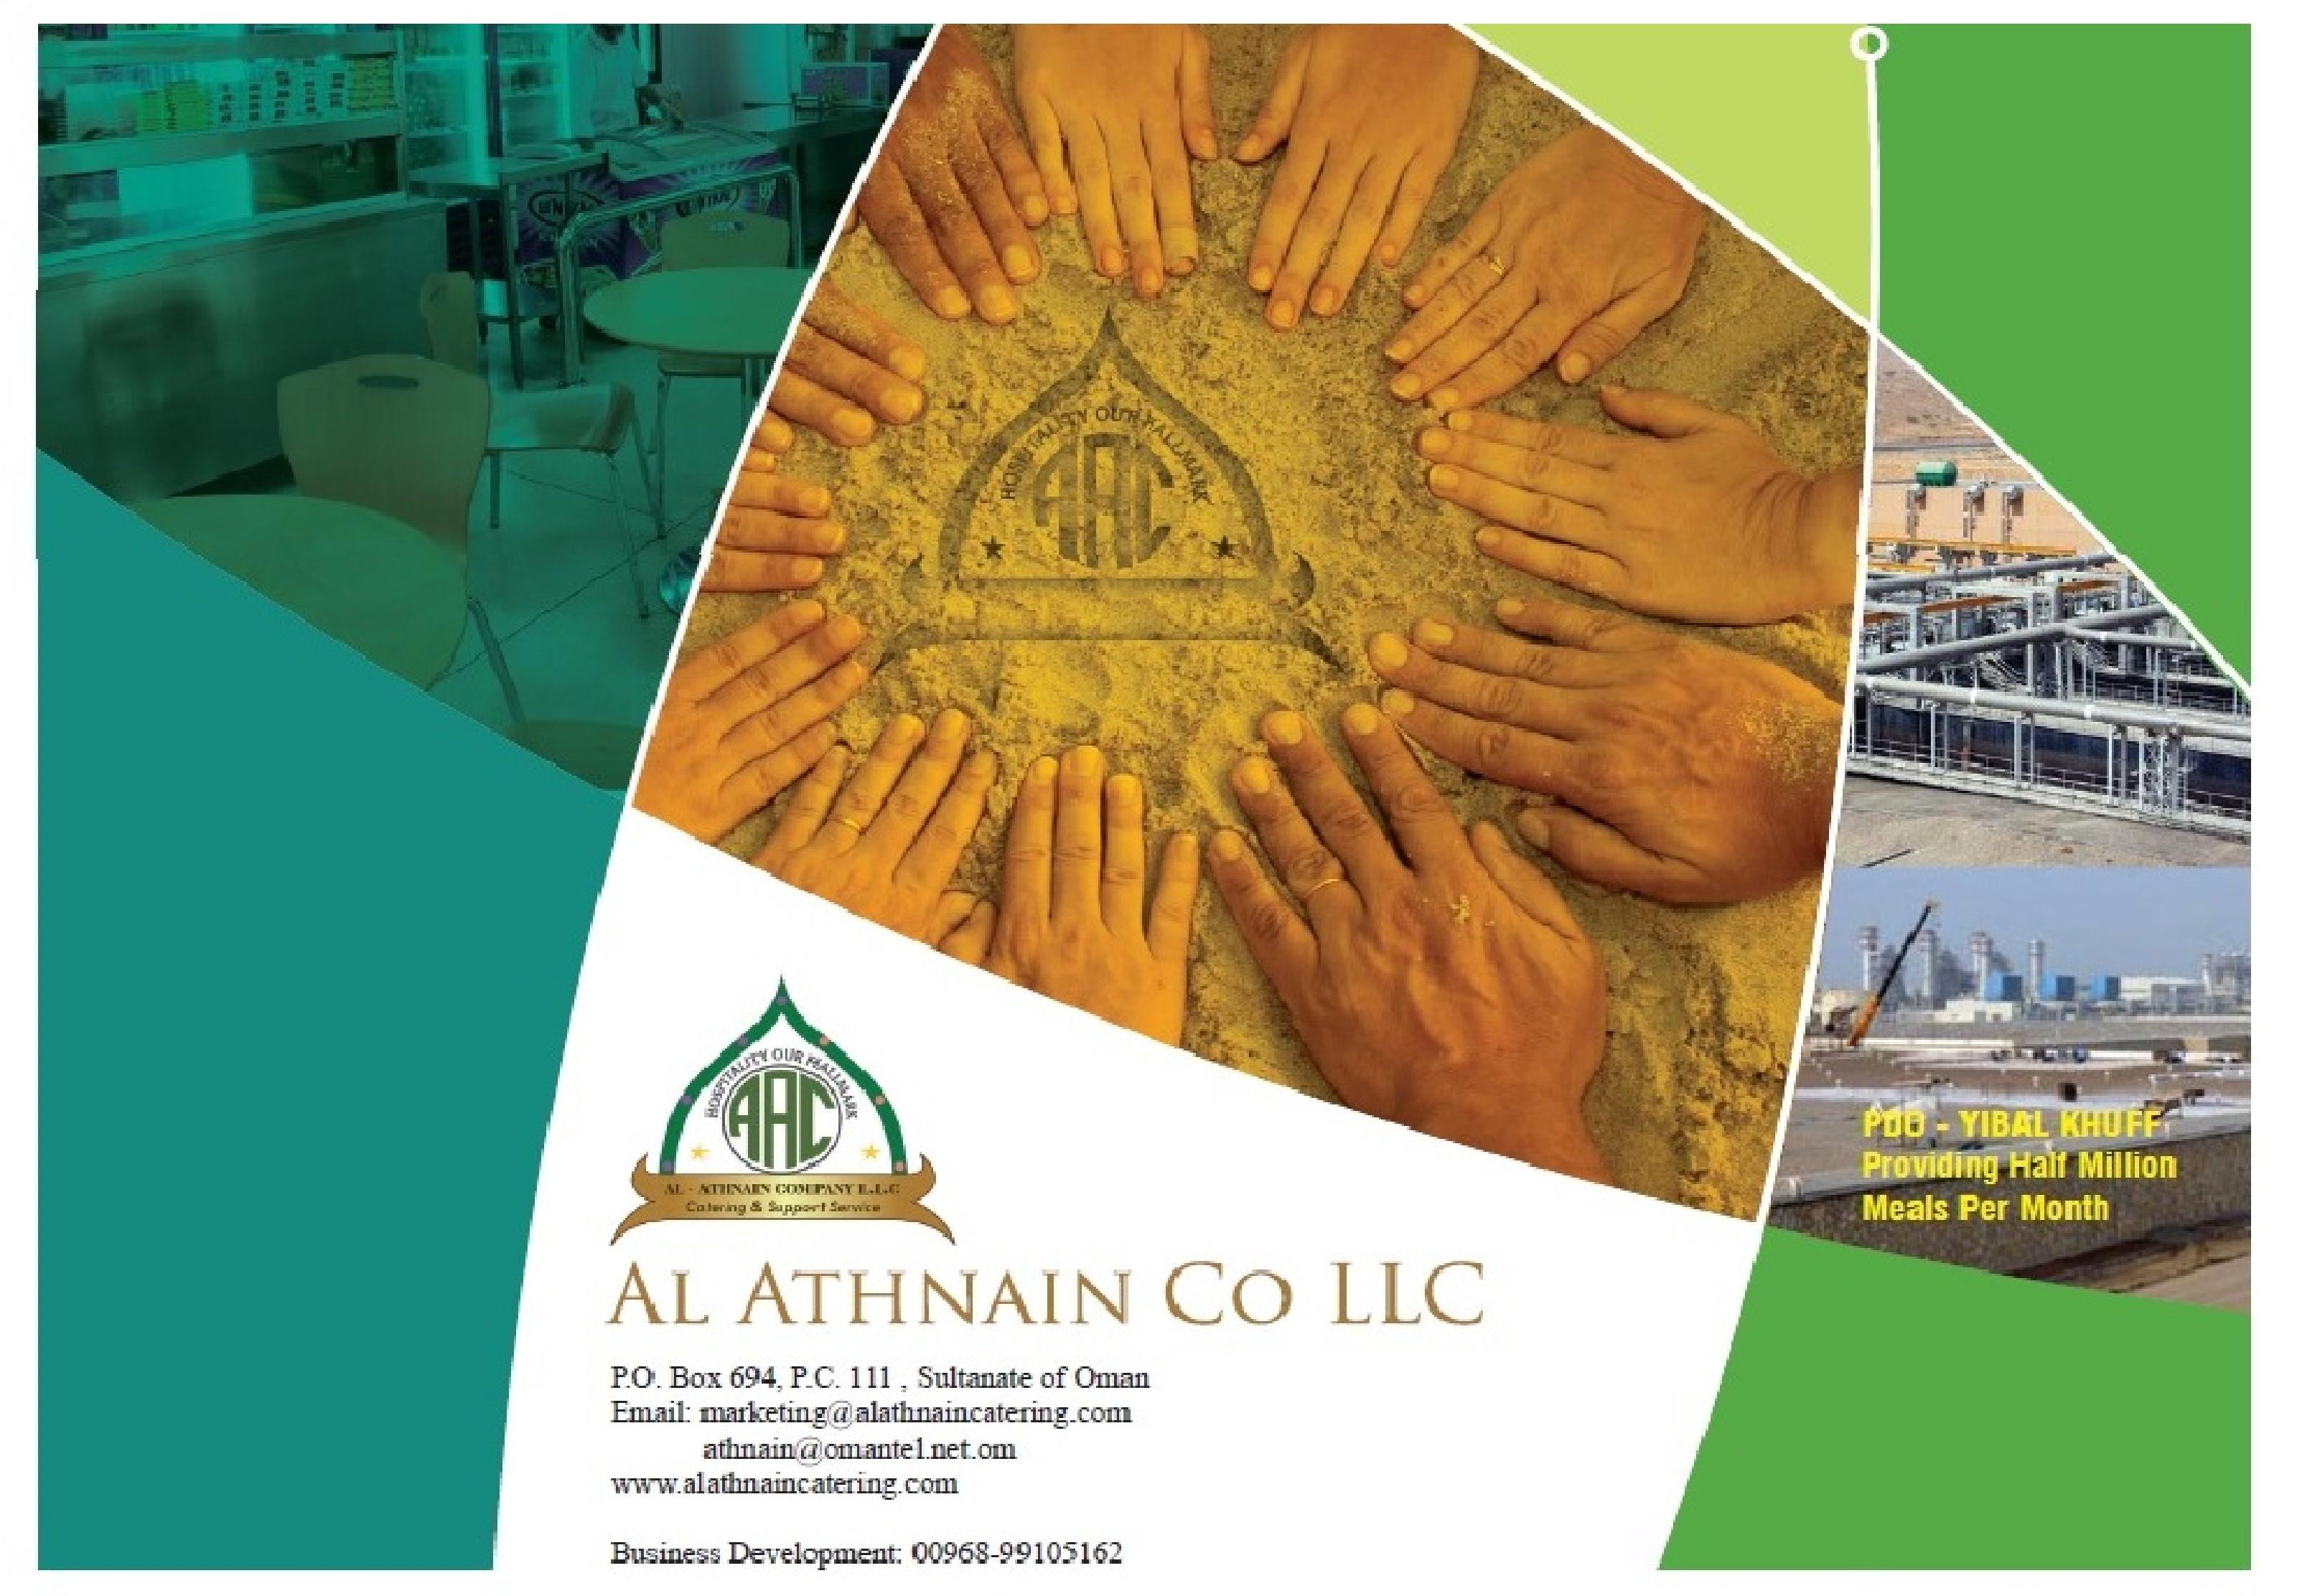 Al Athnain Catering Co  LLC | LinkedIn